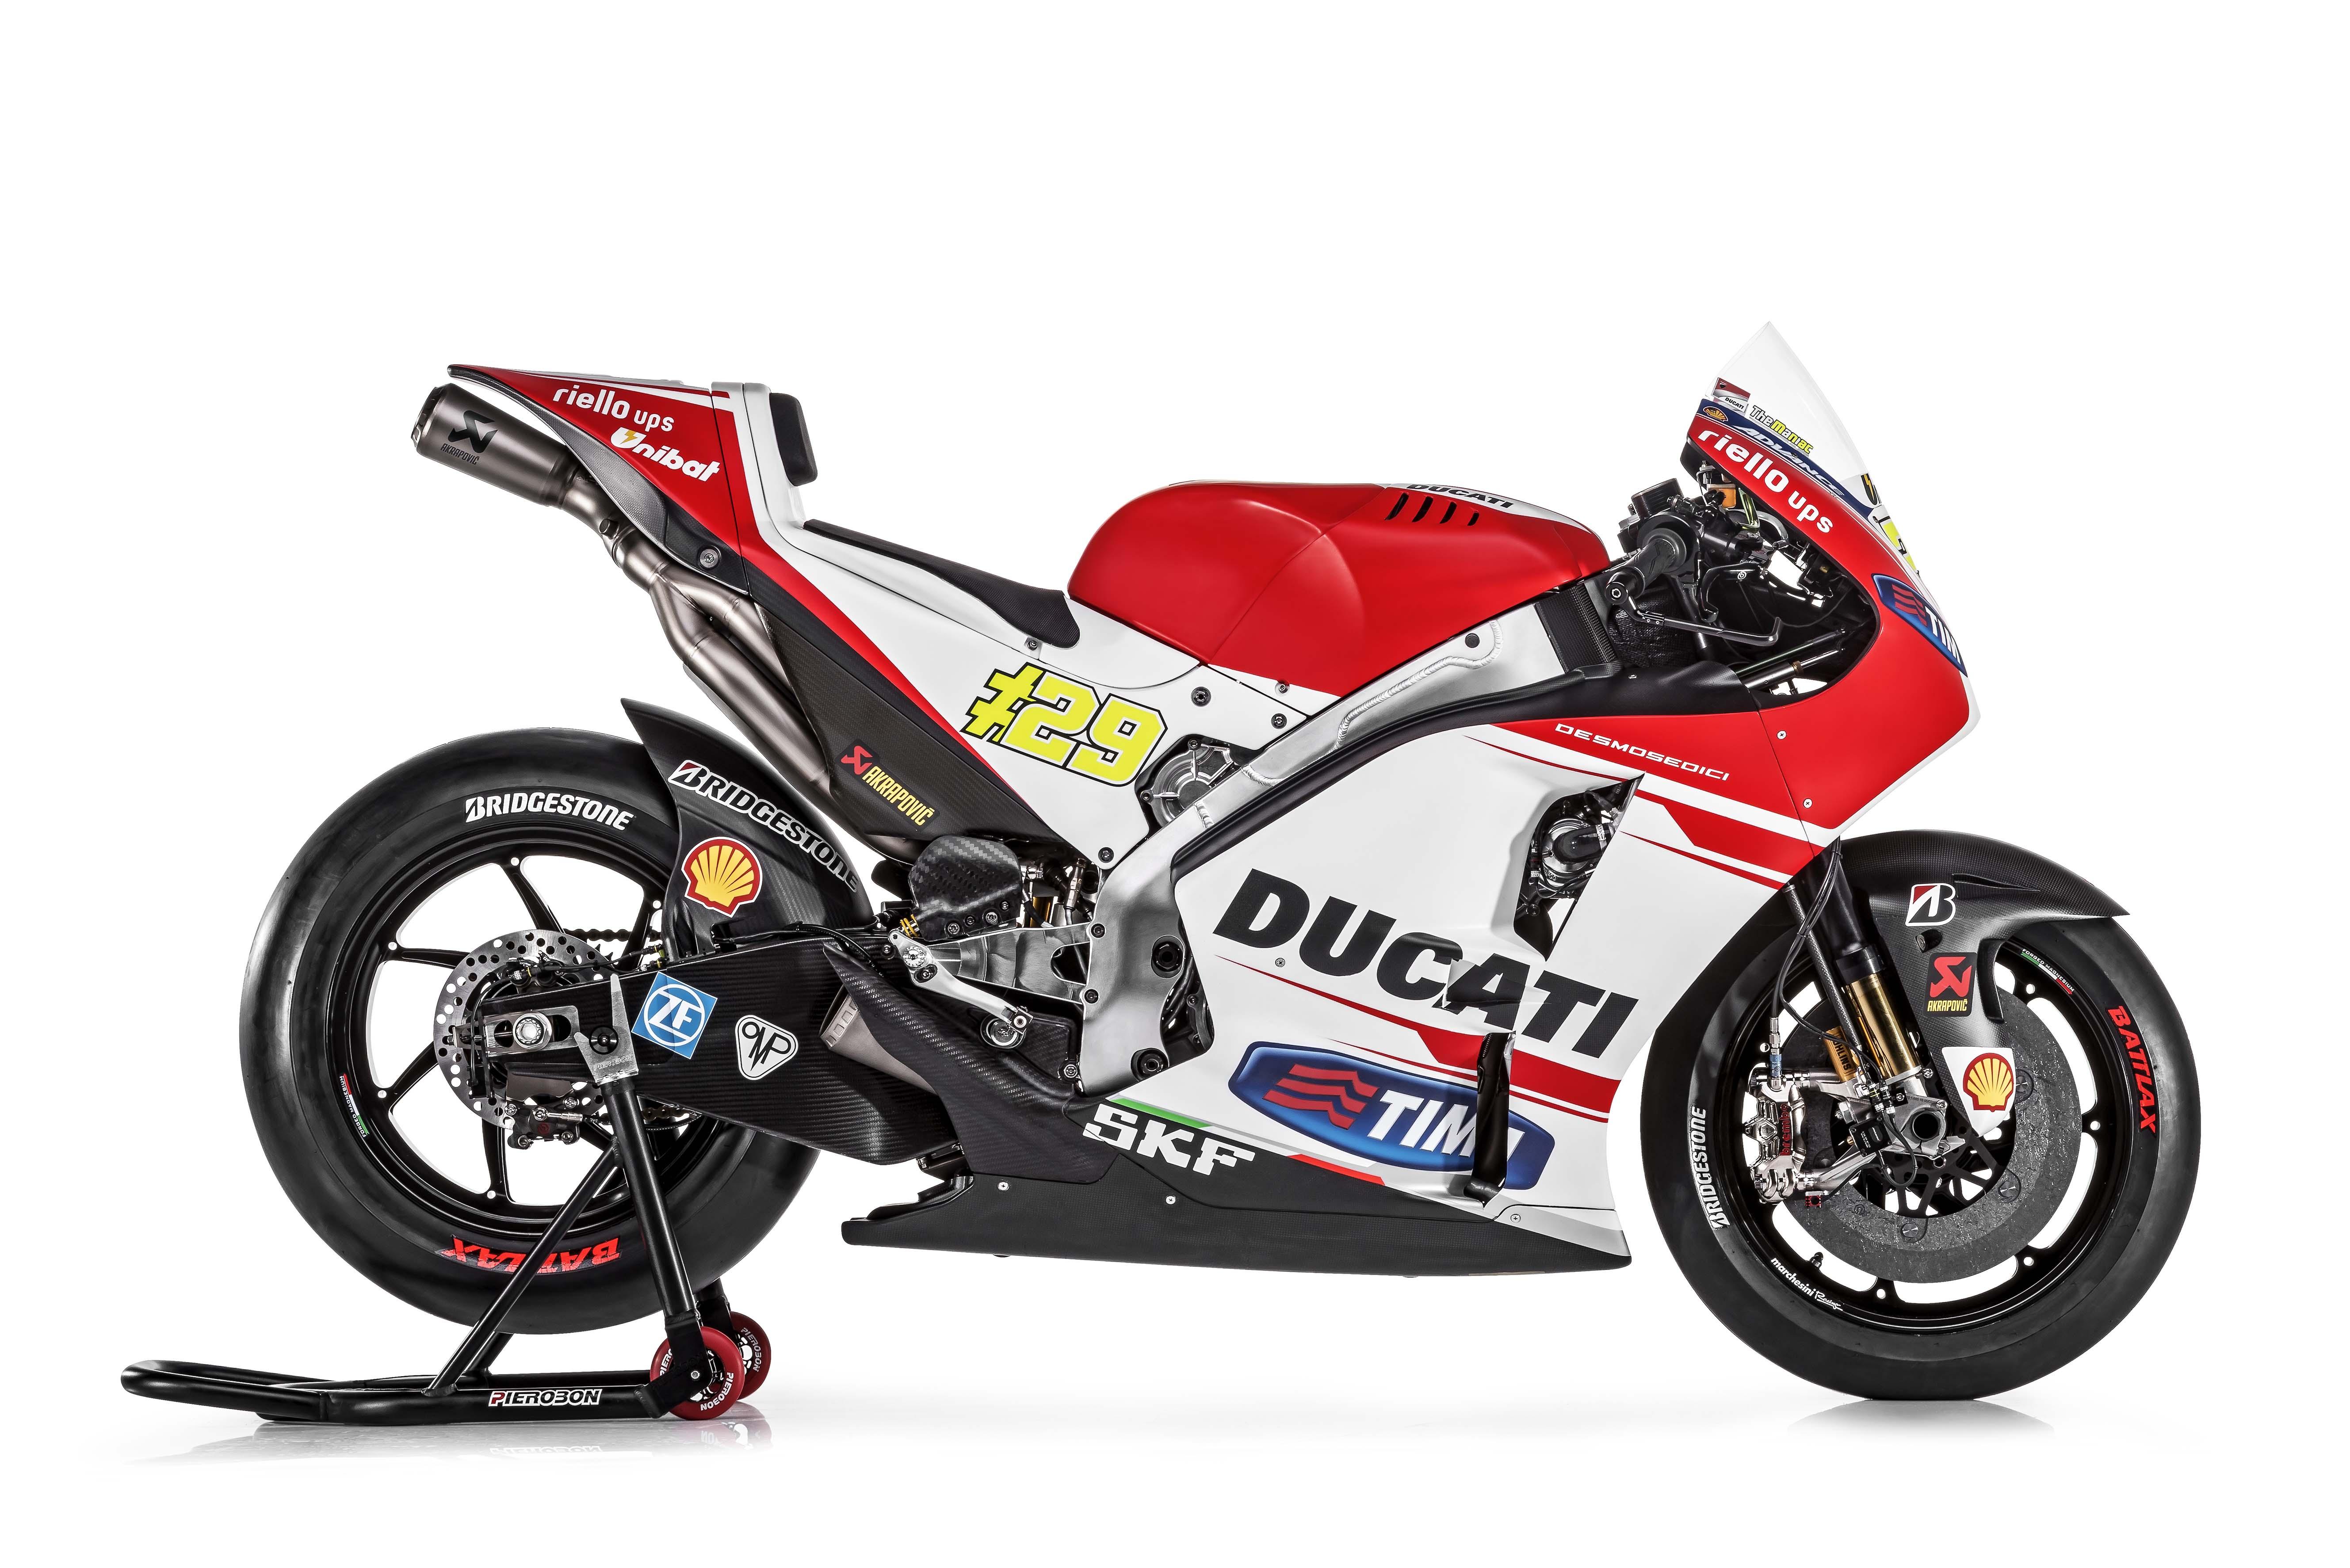 Ducati GP15 2015-Ducati-Desmosedici-GP15-MotoGP-Andrea-Iannone-08